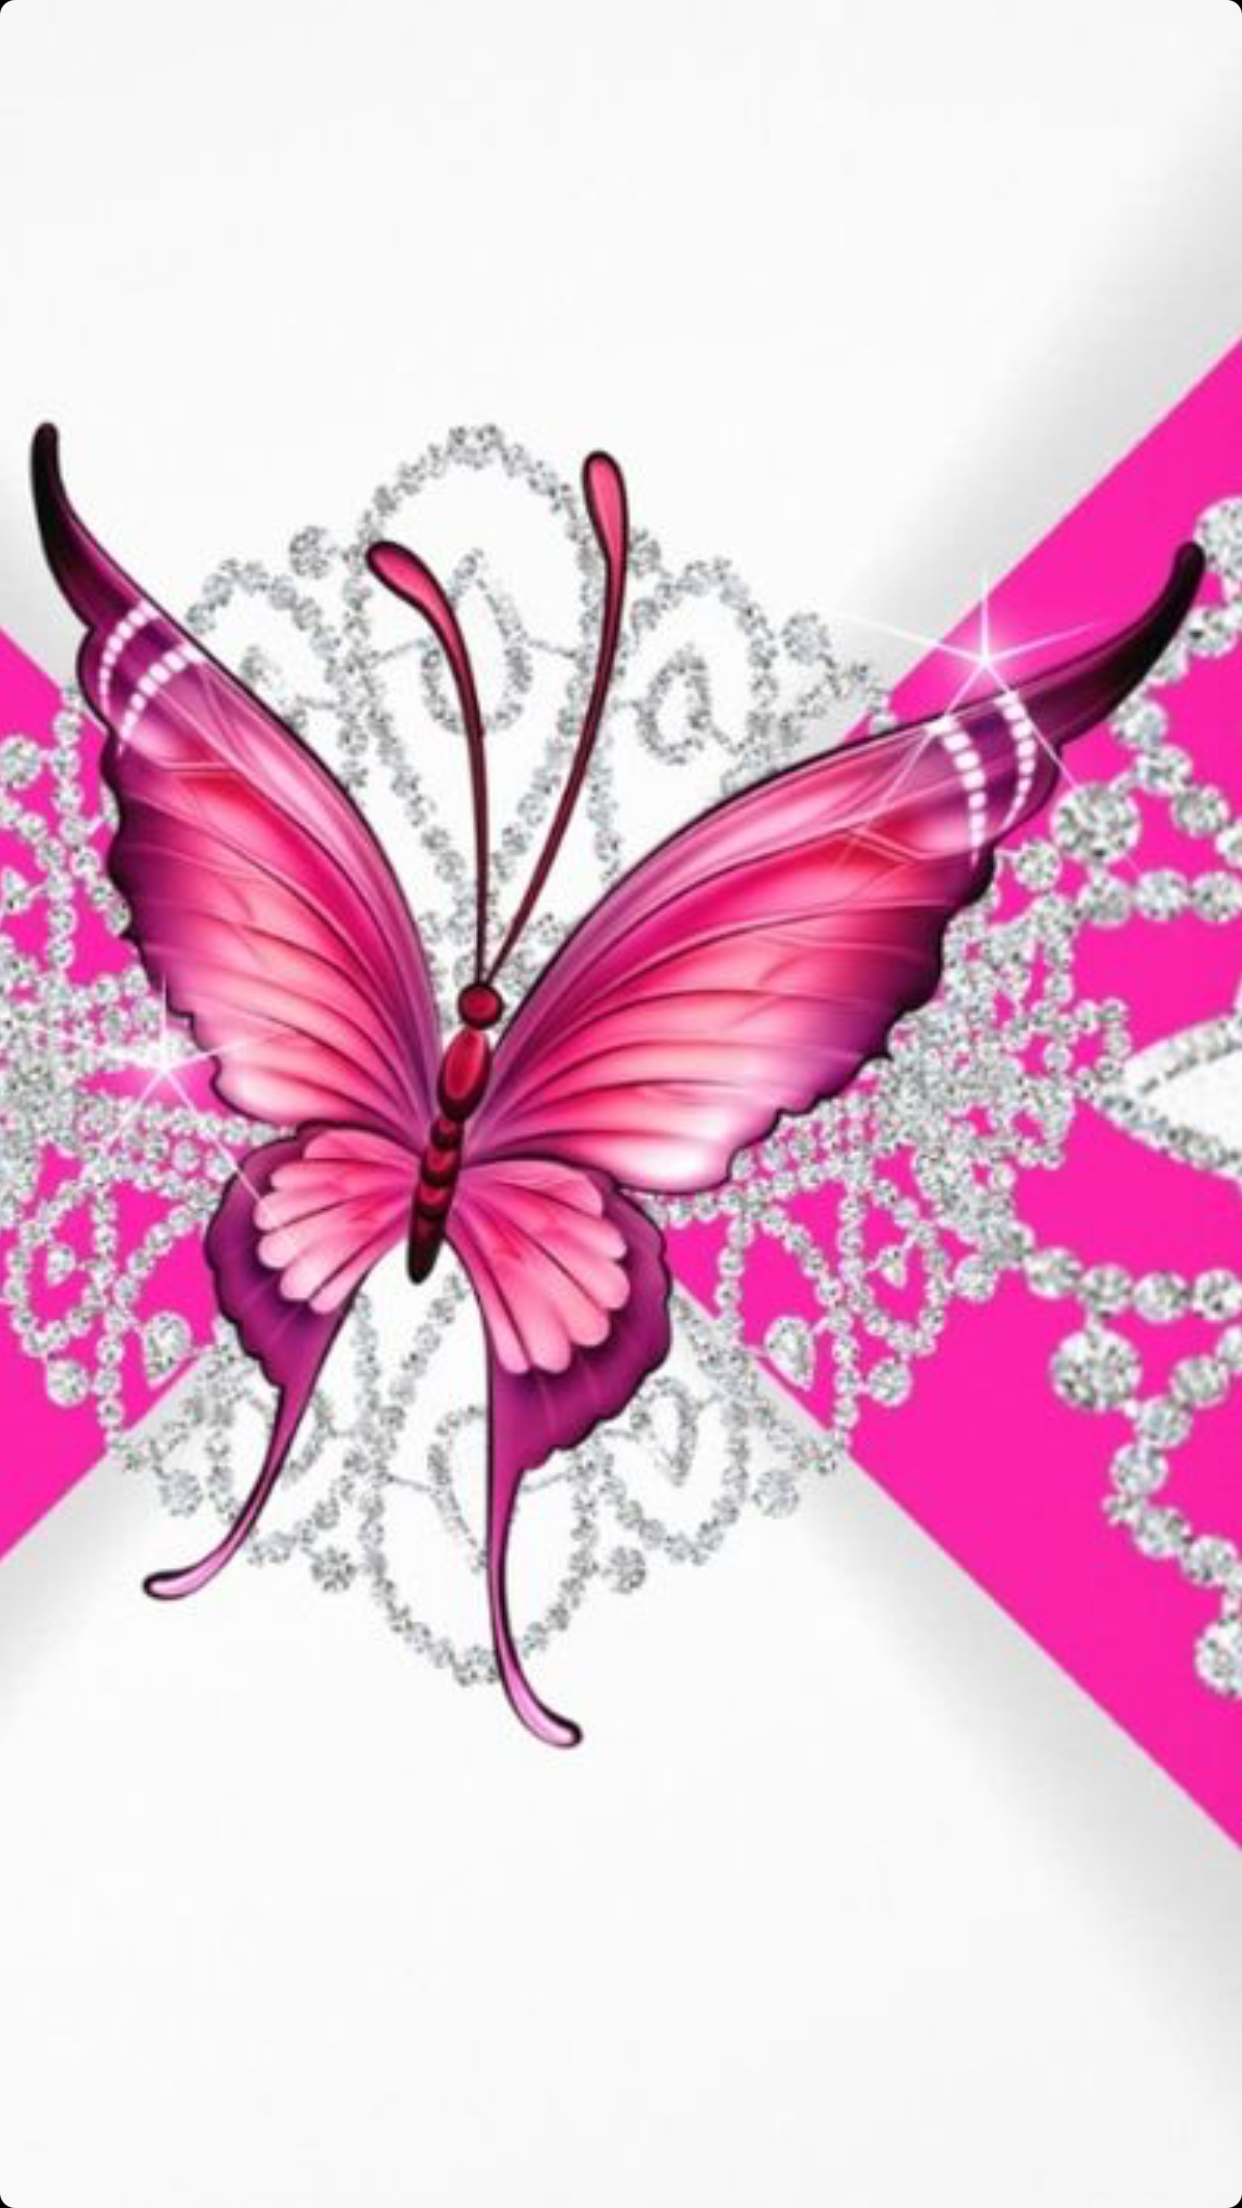 8271d4e8d276a41b09d1f375eb2bea6a png 1242 2208 pink butterfly